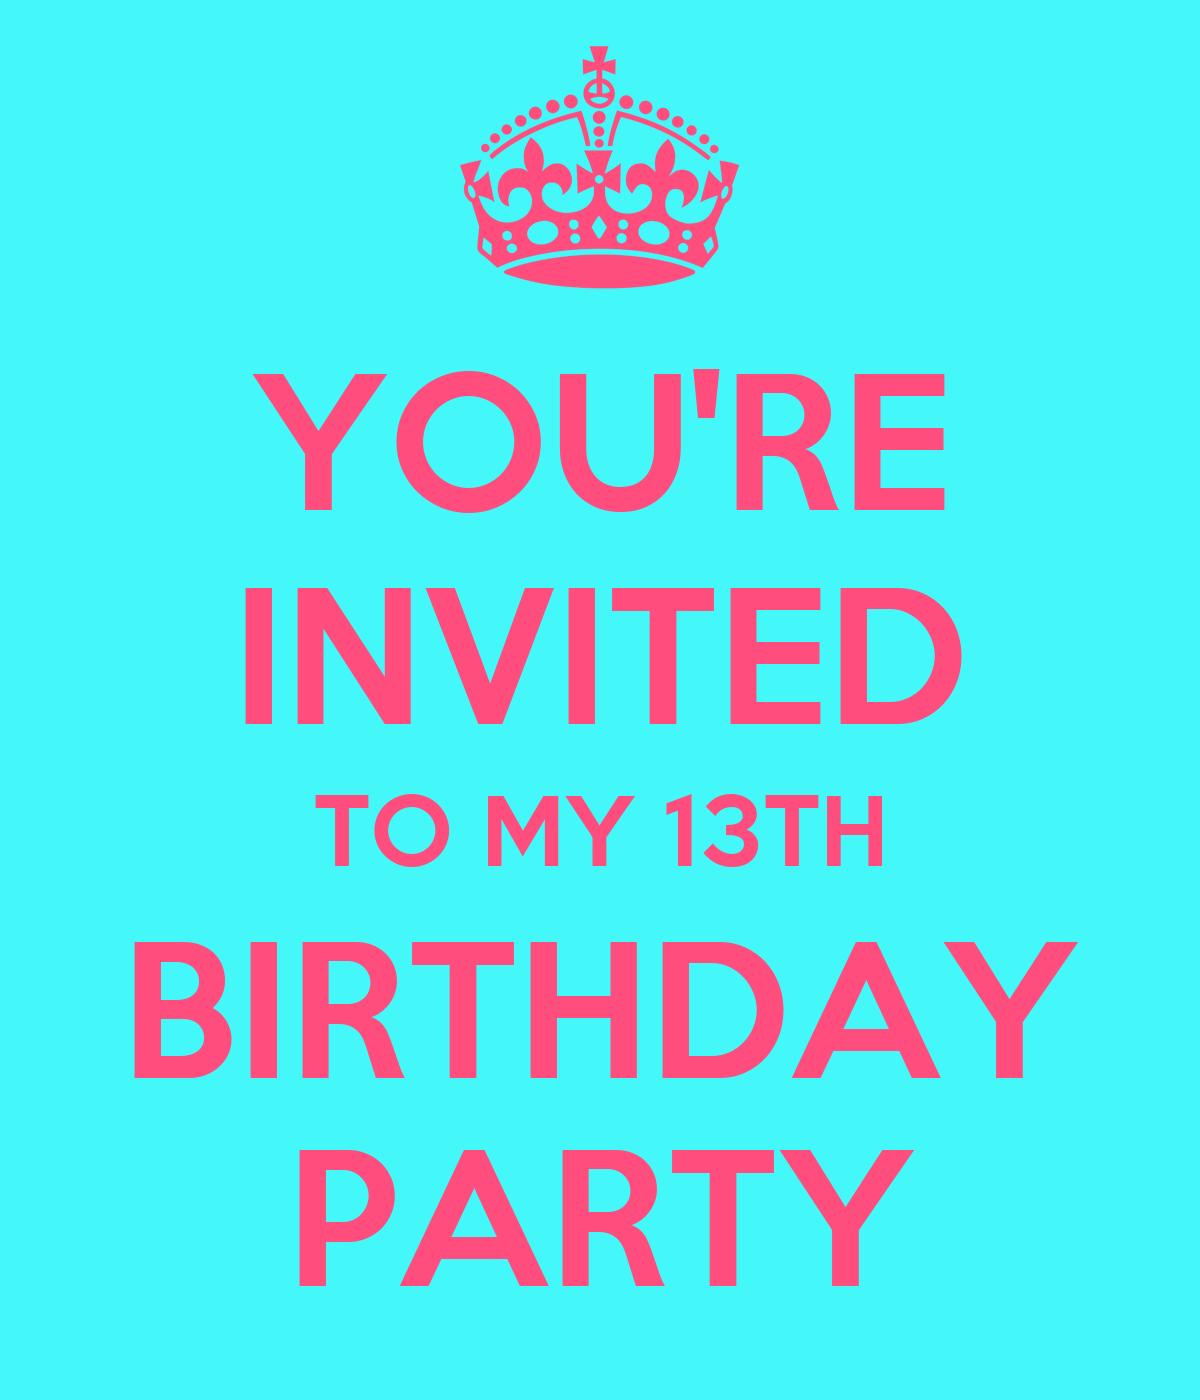 My 13th birthday party